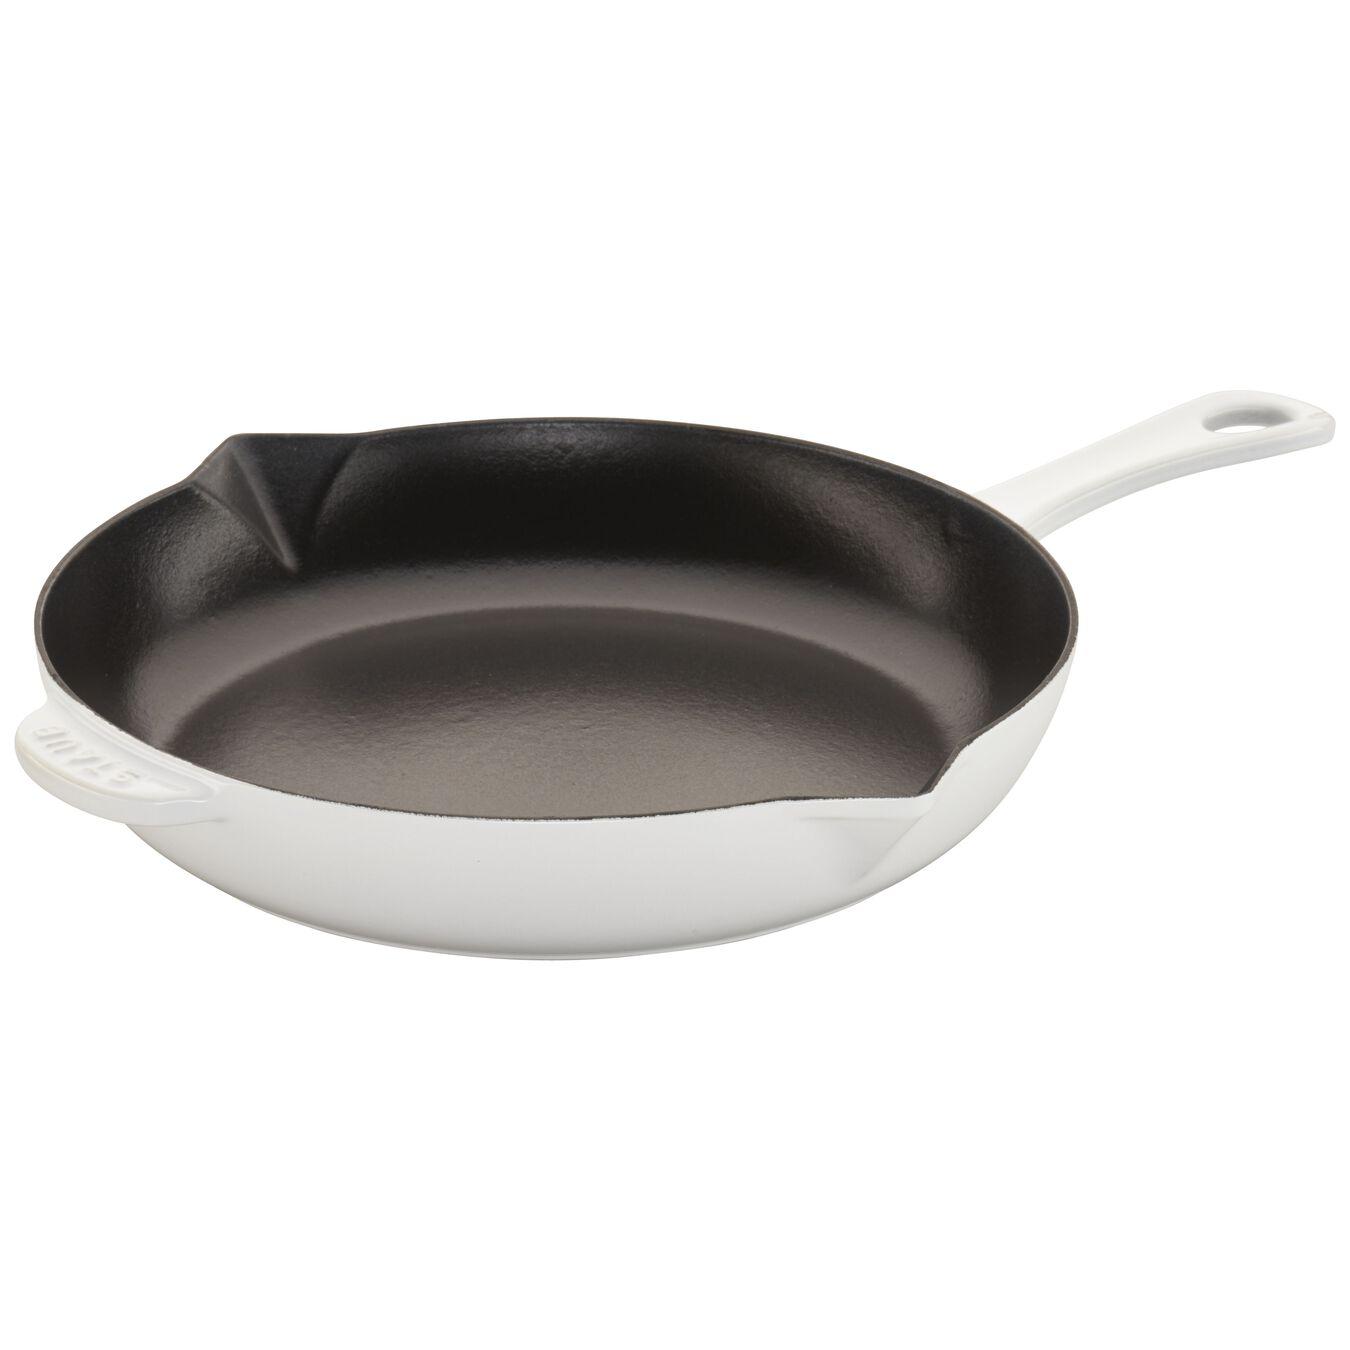 10-inch Fry Pan - White,,large 5